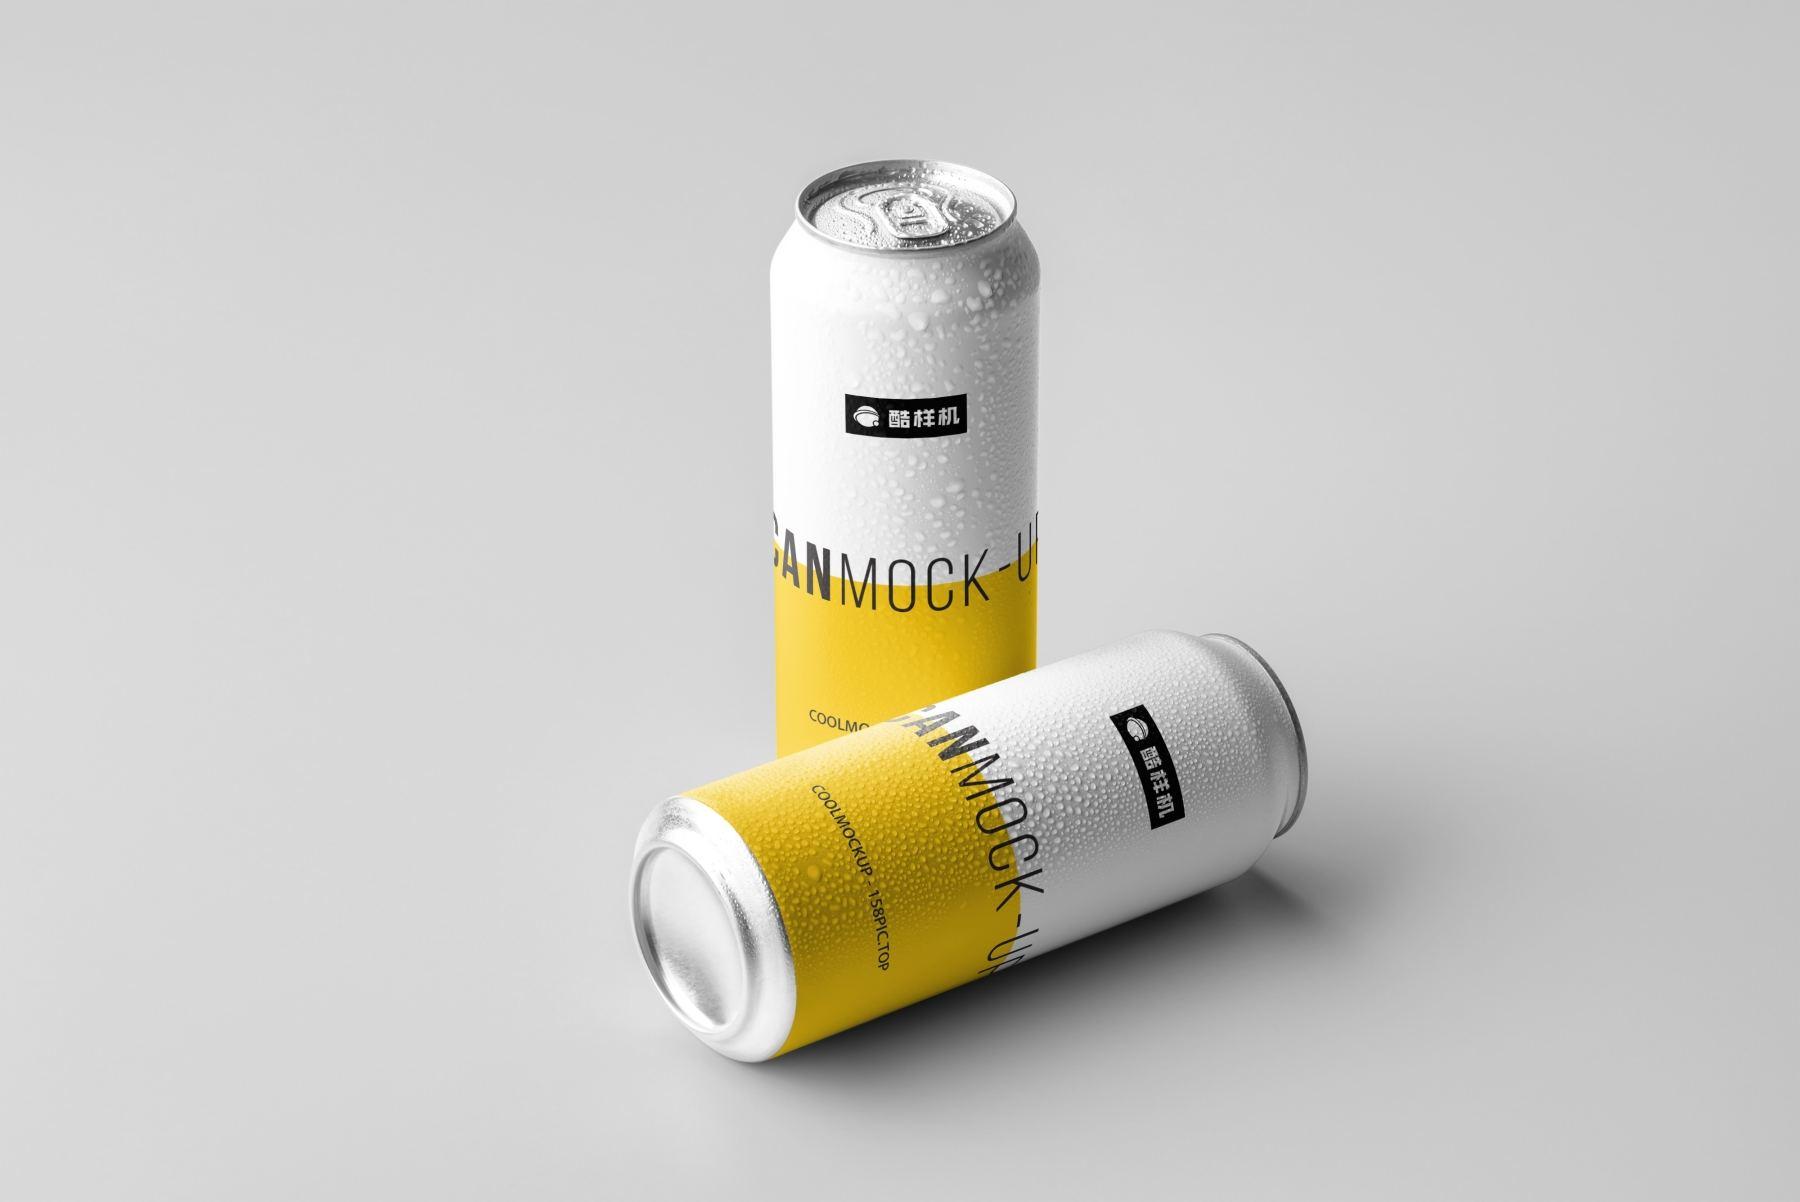 6e3ee5f7b61a847 - 简约饮料啤酒包装易拉罐样机